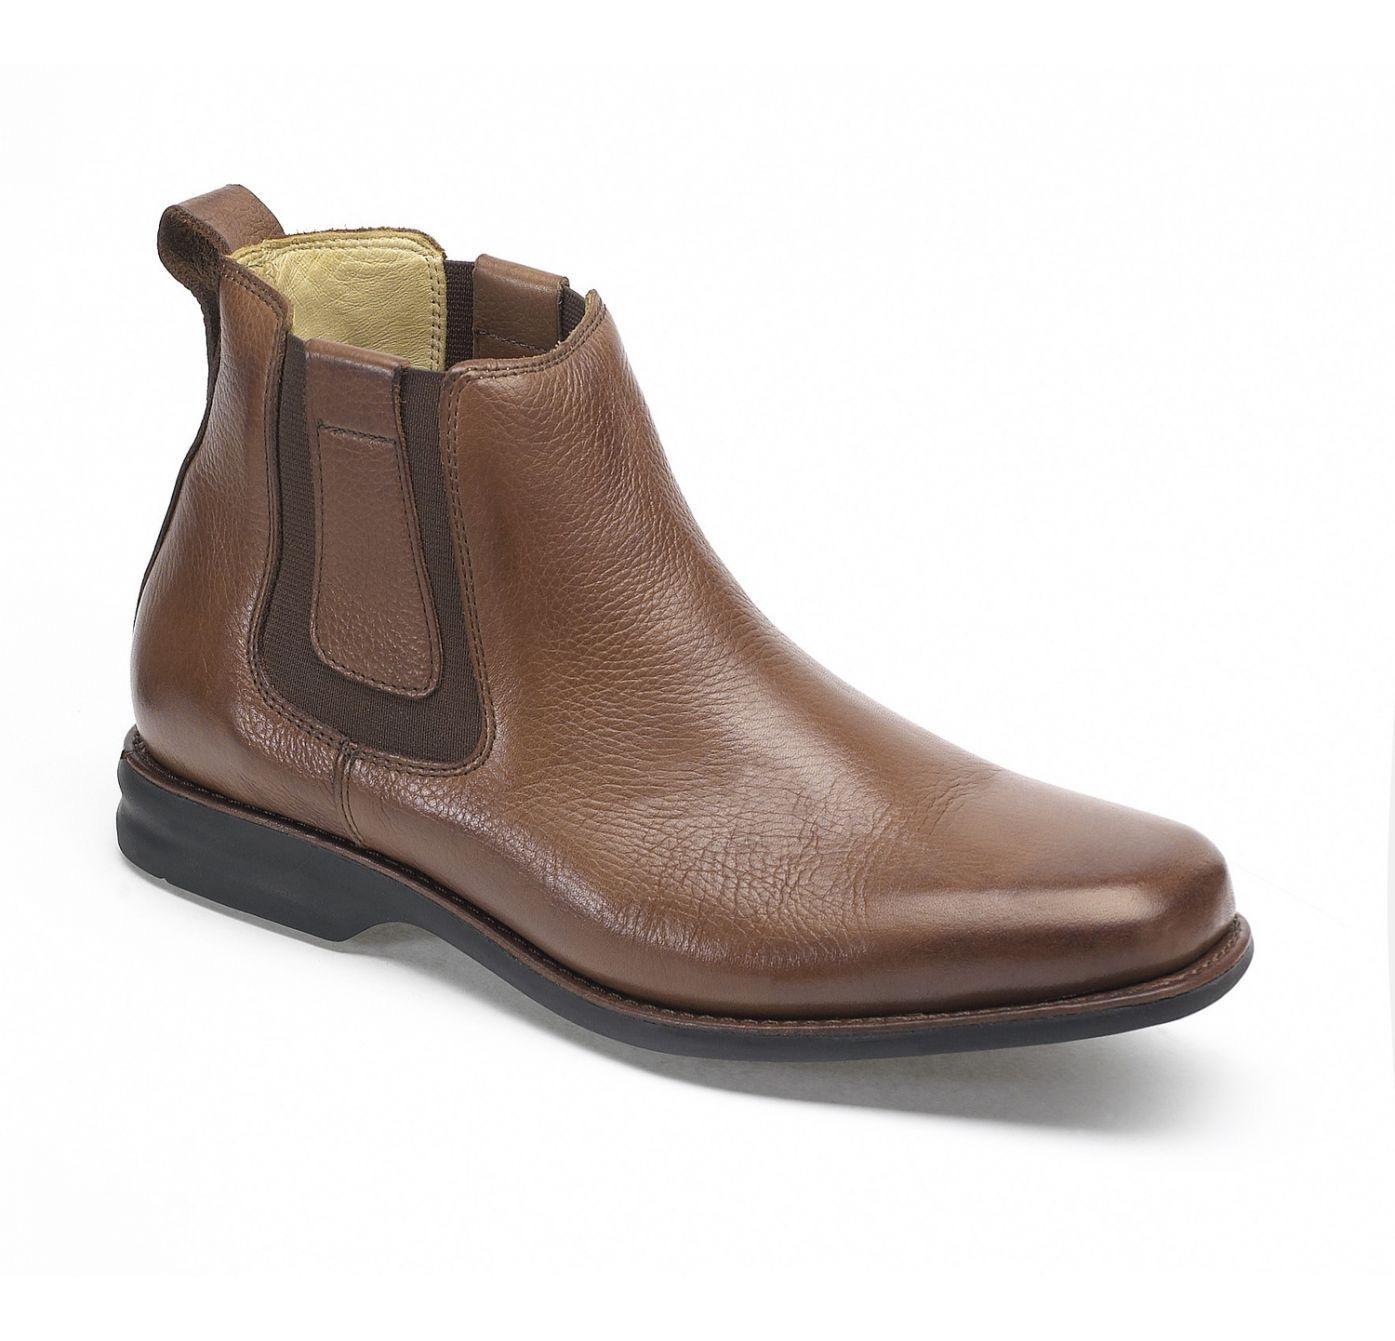 Anatomic Gel Shoes